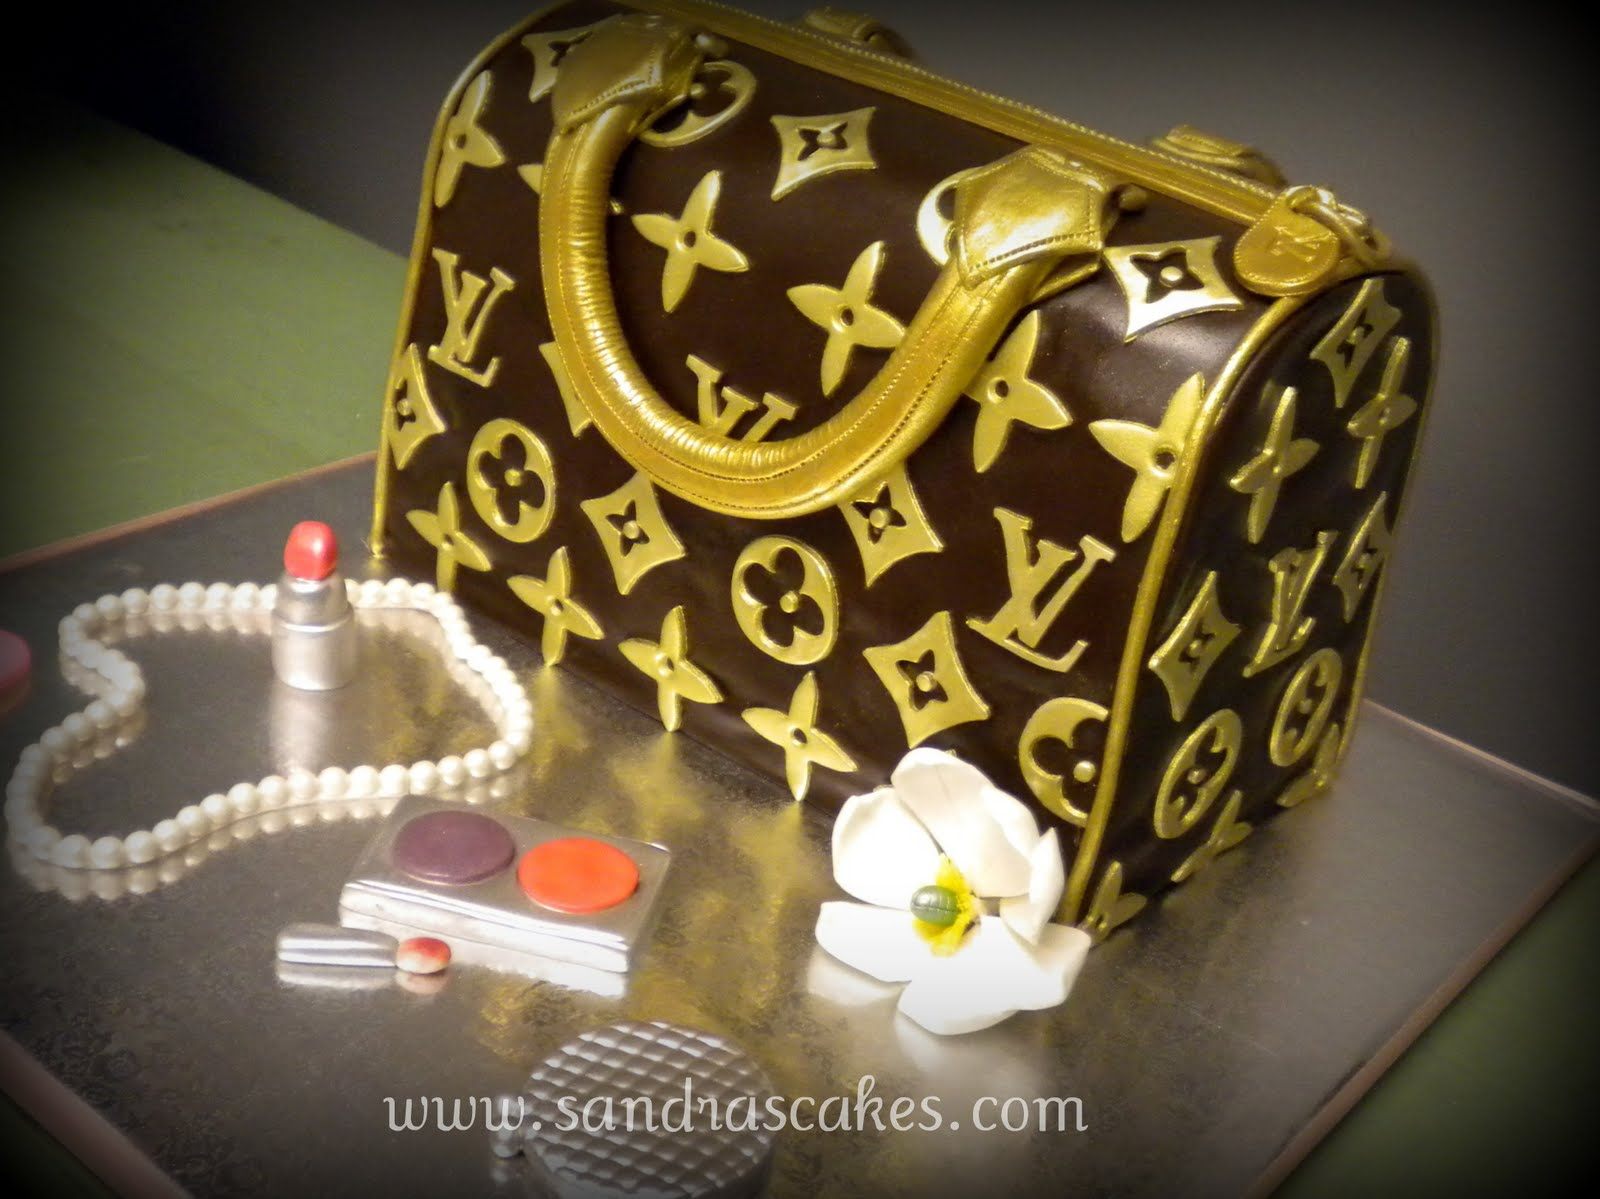 designer-bags-lv-gucci-prada-cakes-cupcakes-7